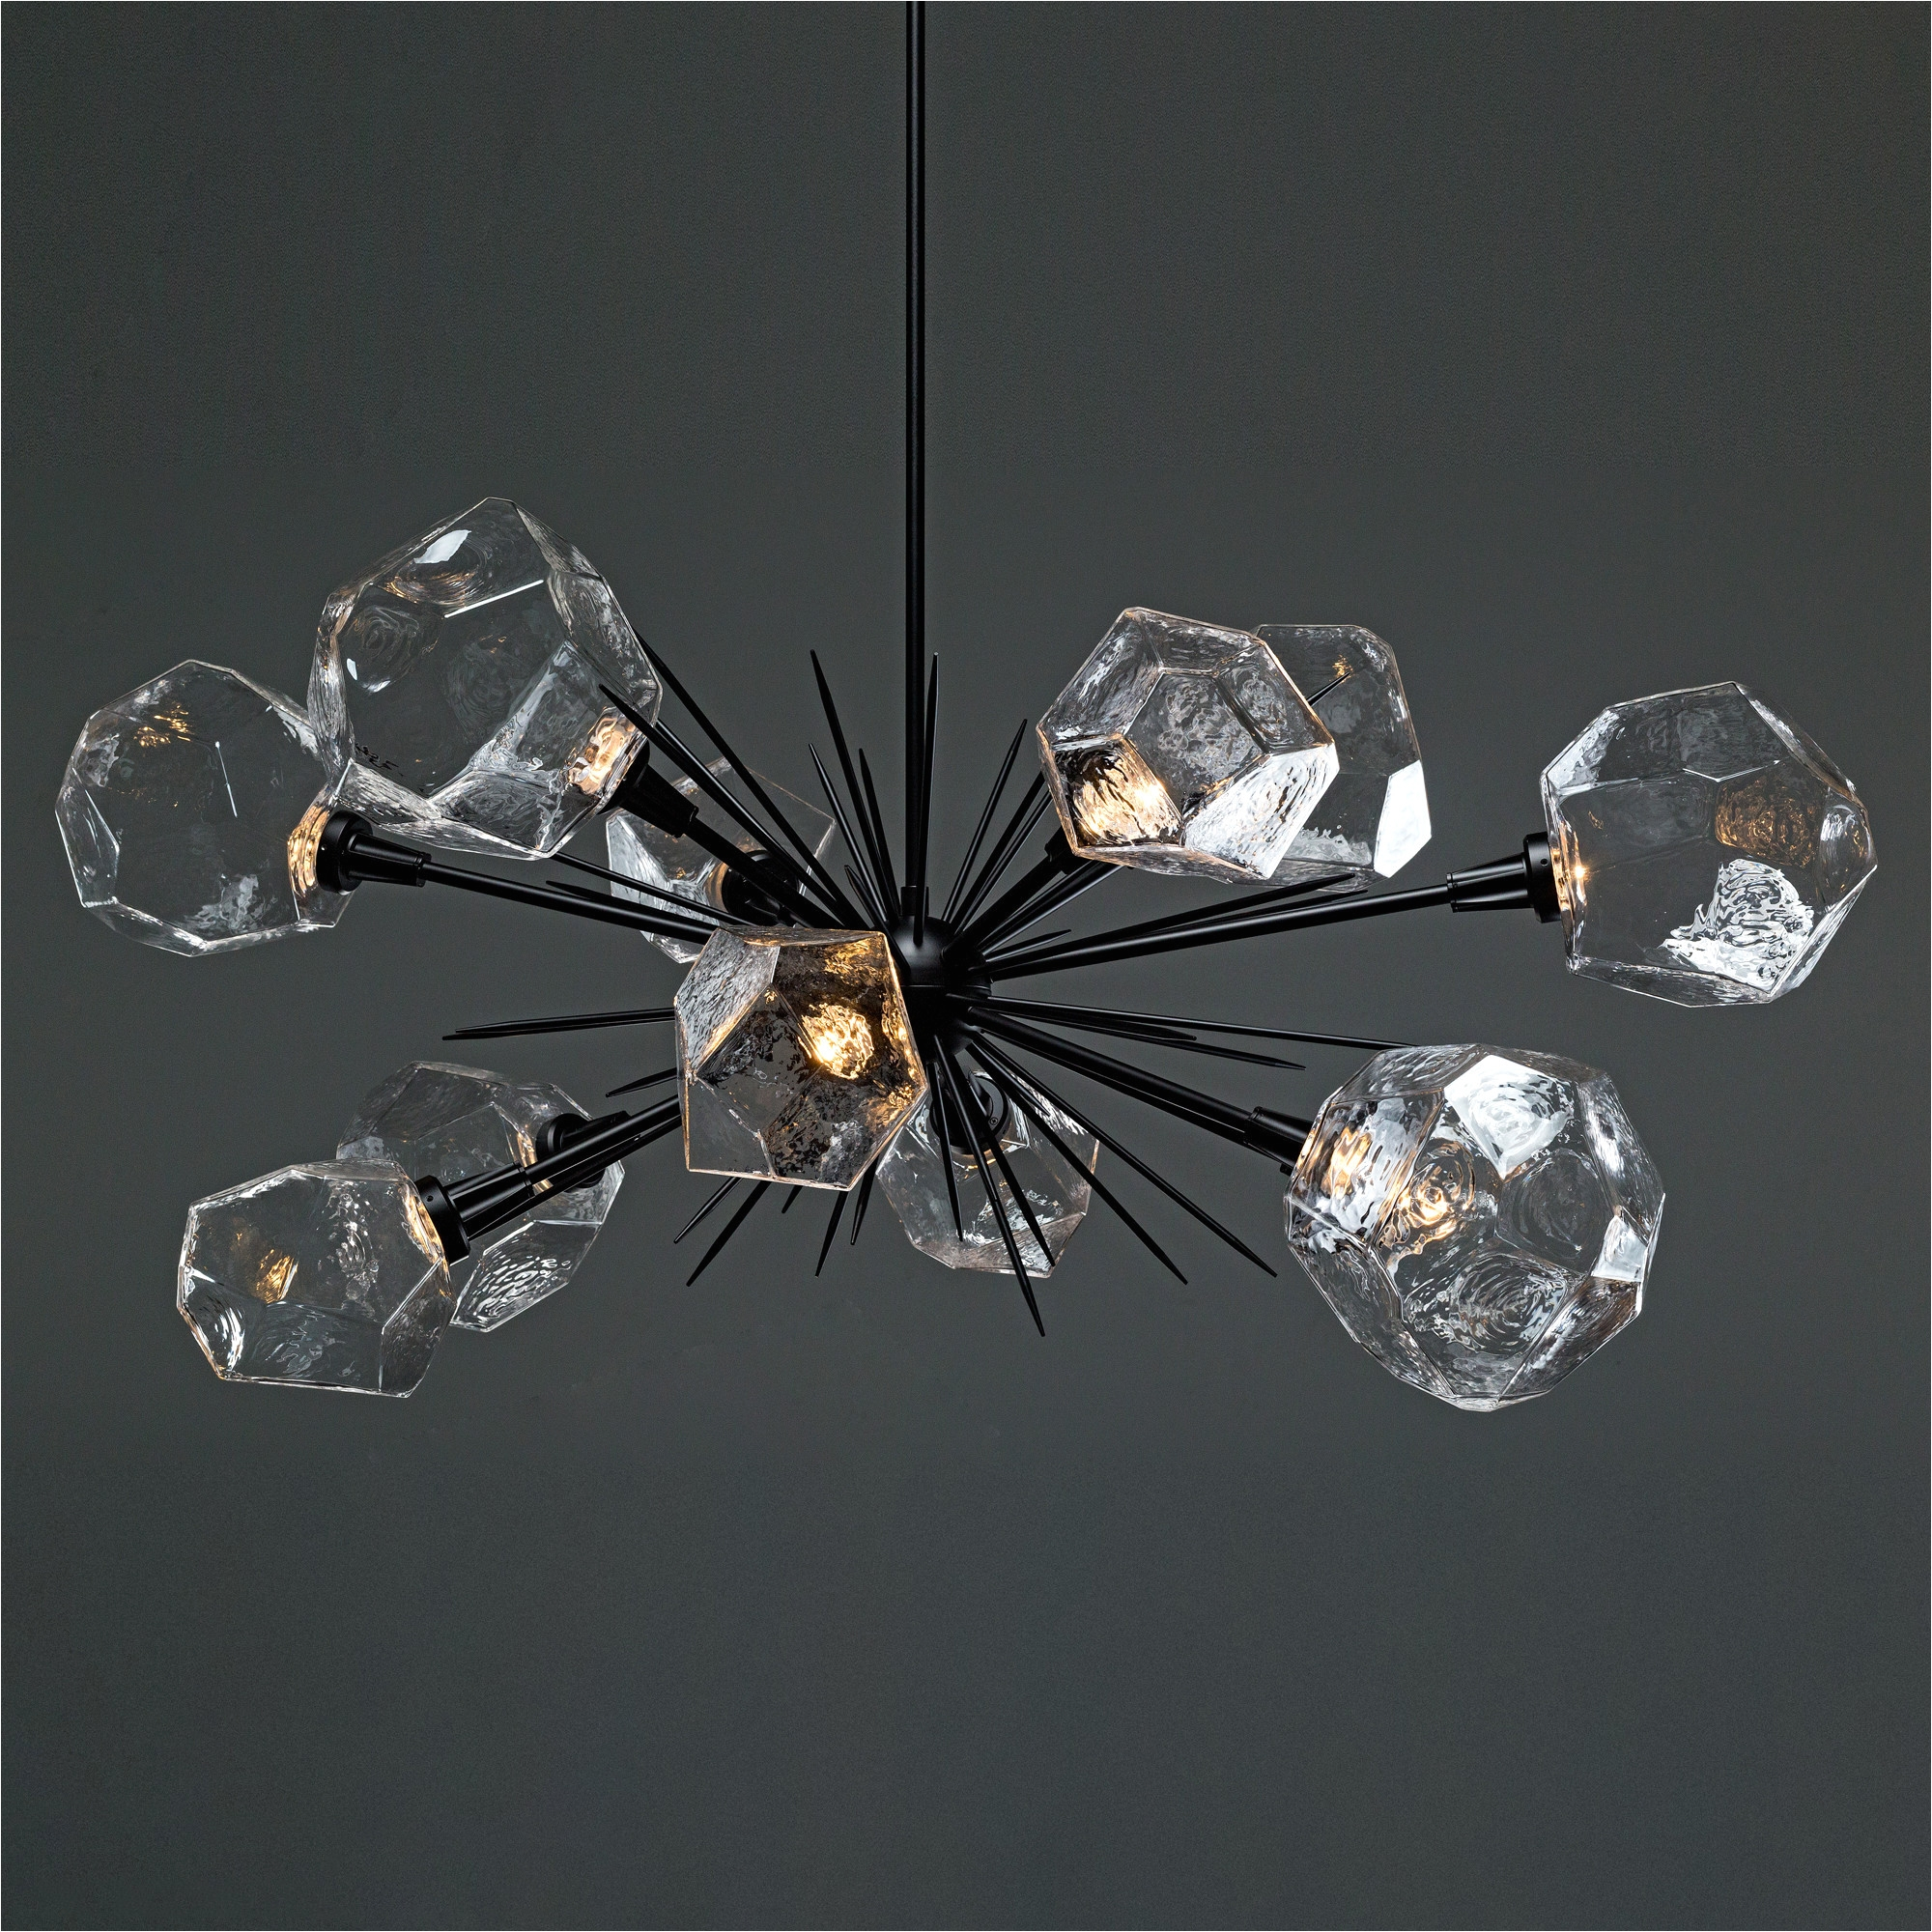 outdoor ceiling lights best of 50 beautiful outdoor led ceiling lights 50 s of outdoor ceiling